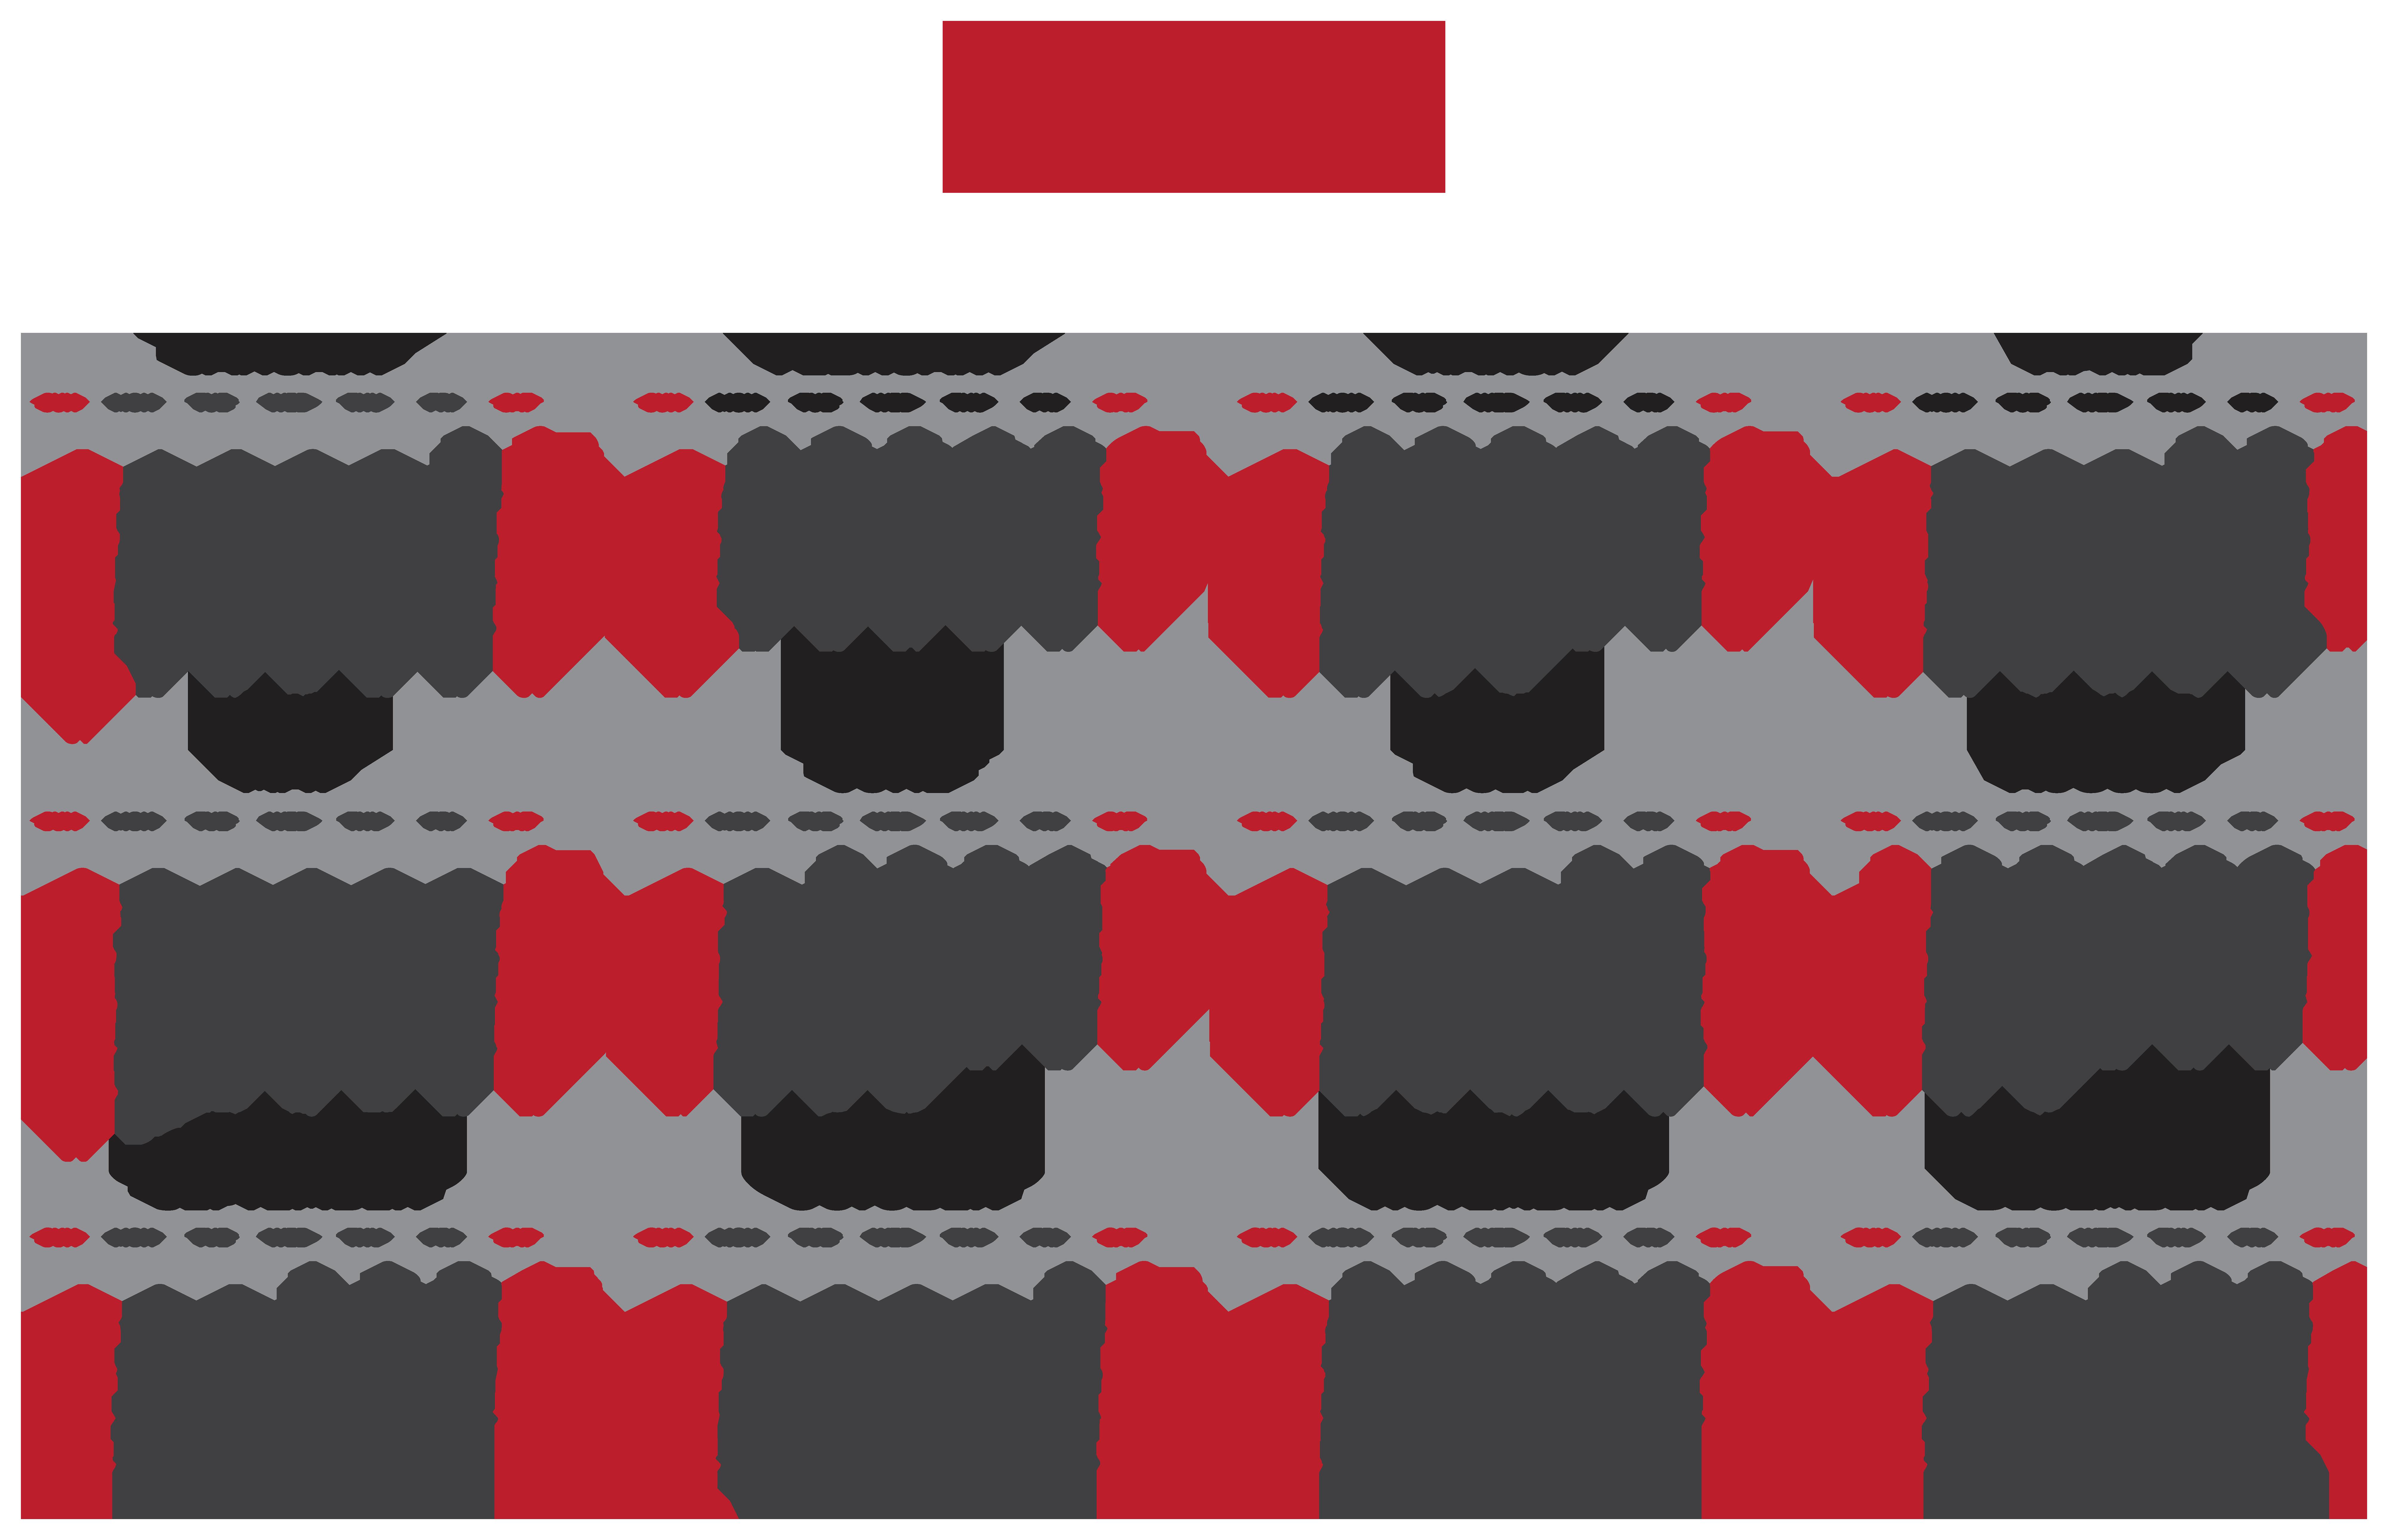 Calendar Wallpaper 2021 Calendar 2021 Wallpapers   Wallpaper Cave